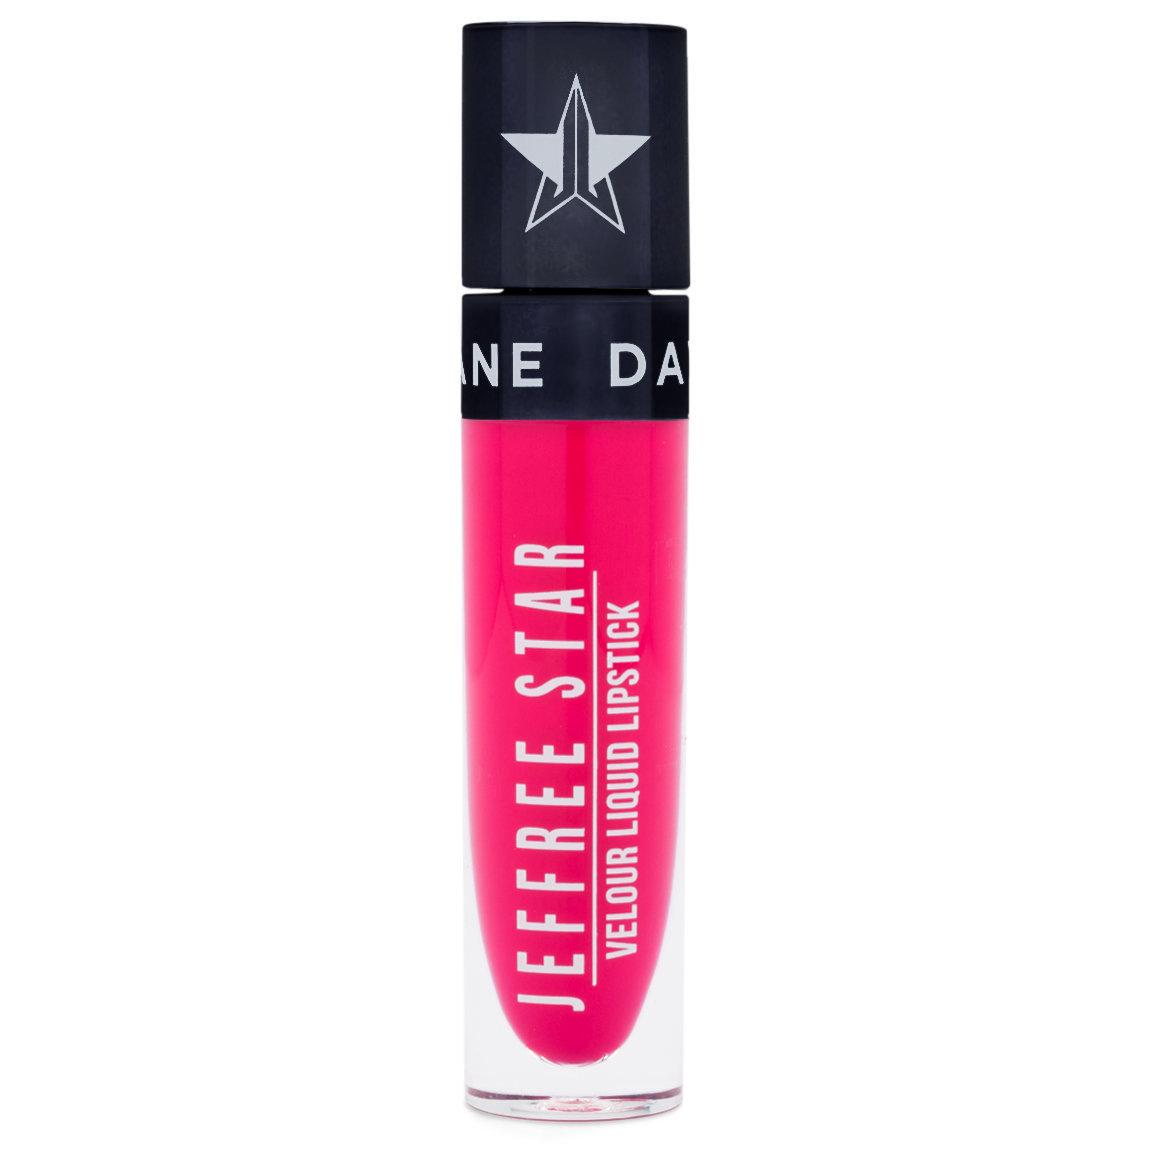 Jeffree Star Cosmetics Velour Liquid Lipstick Jeffree, What The Fuck?